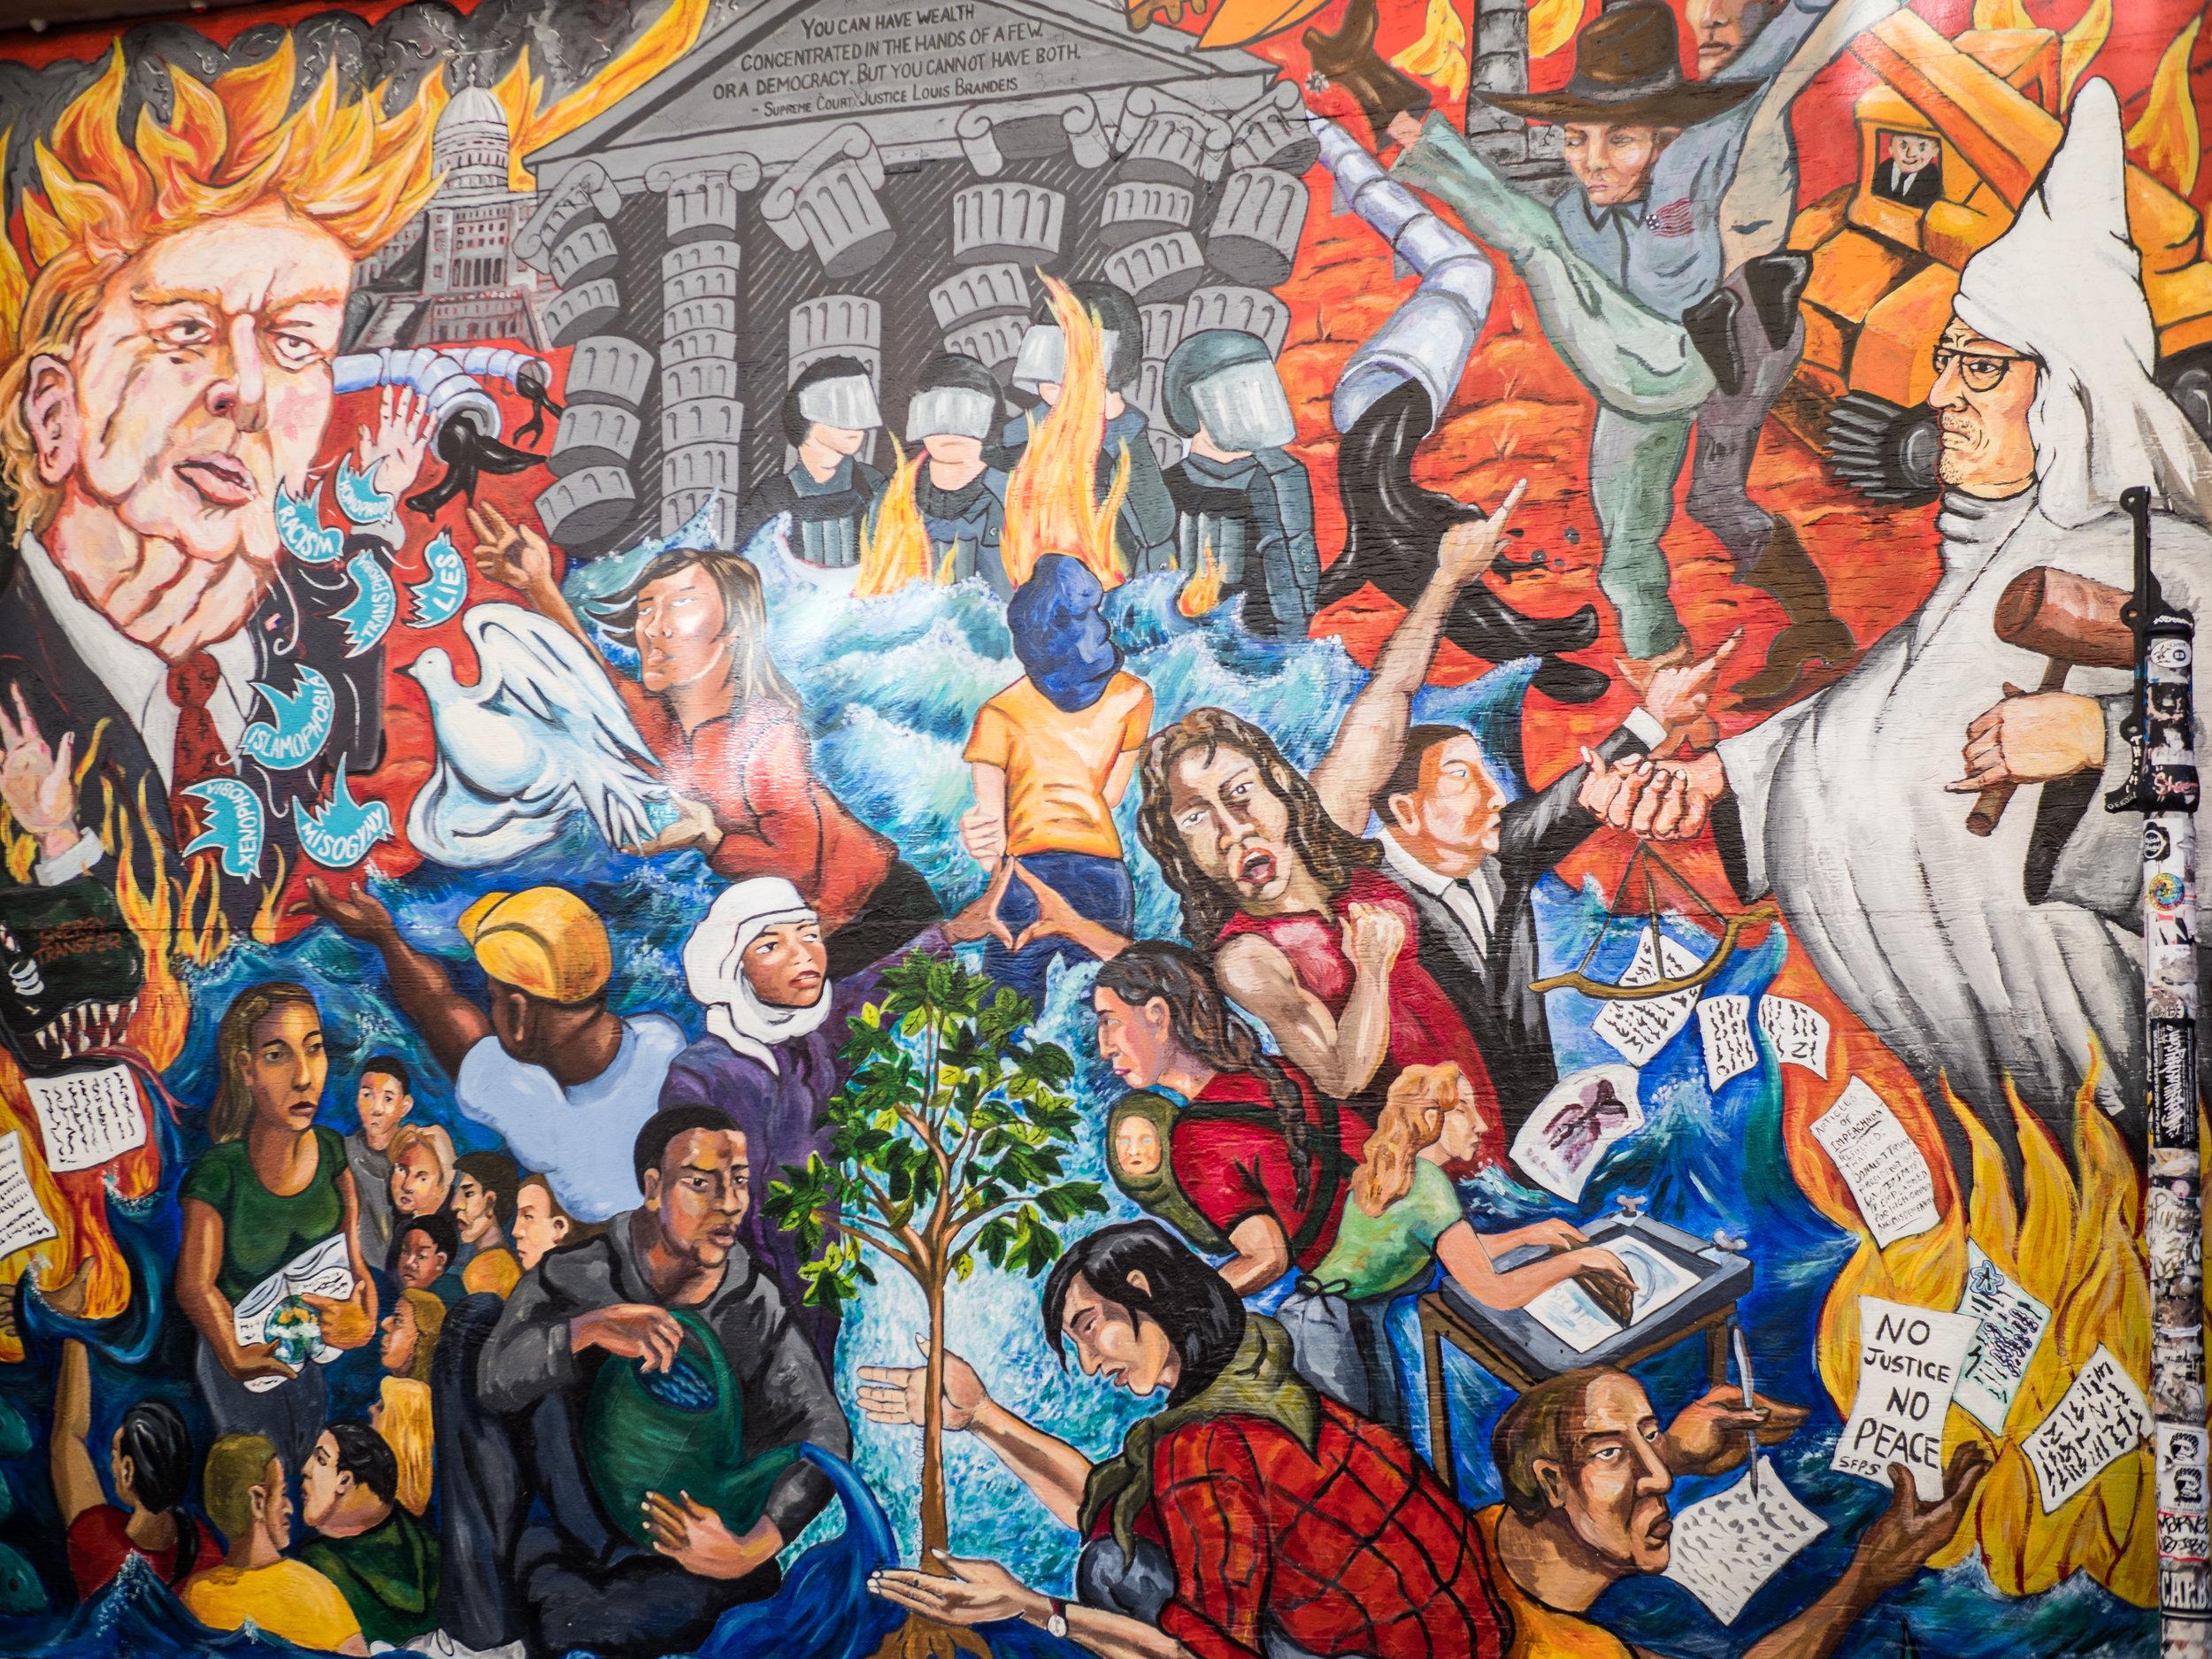 Graffiti in Graffiti Alley in the Mission District of San Francisco